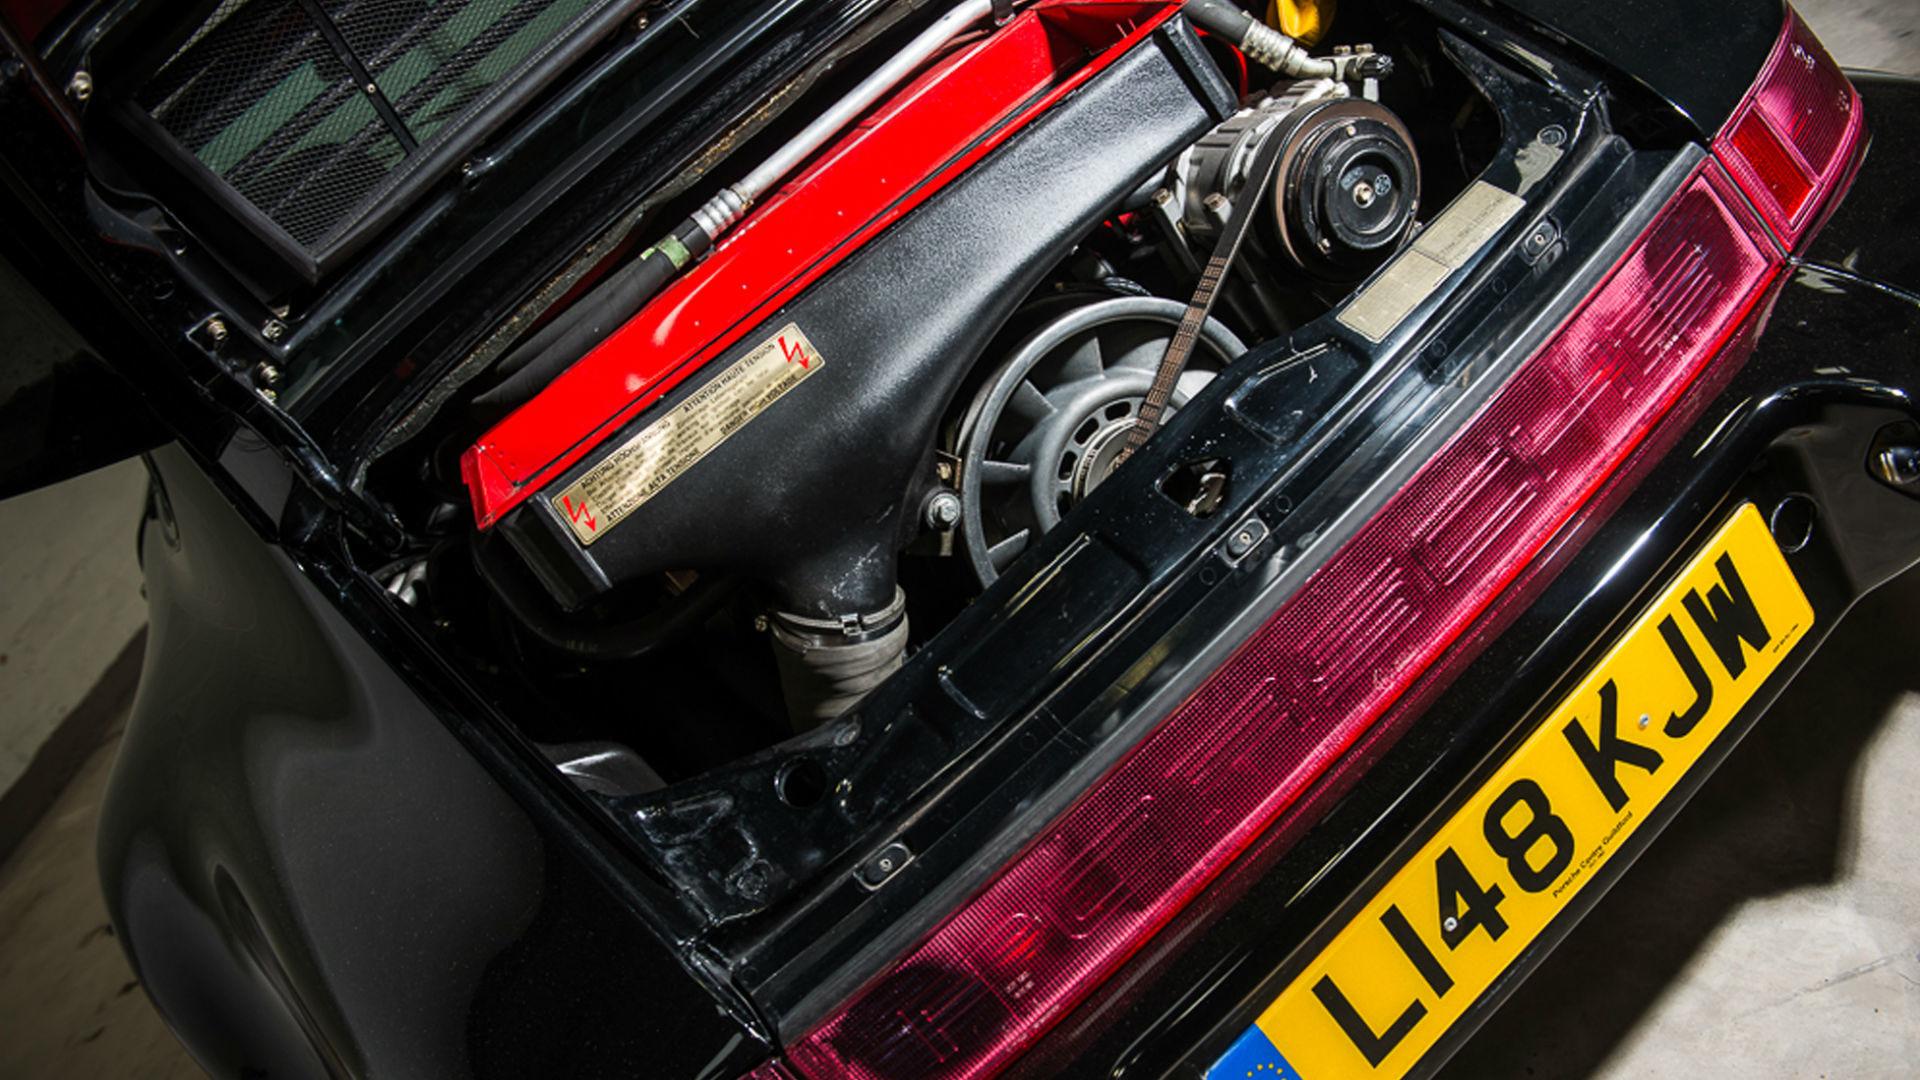 1993-porsche-911-964-turbo-s-leichtbau (1)